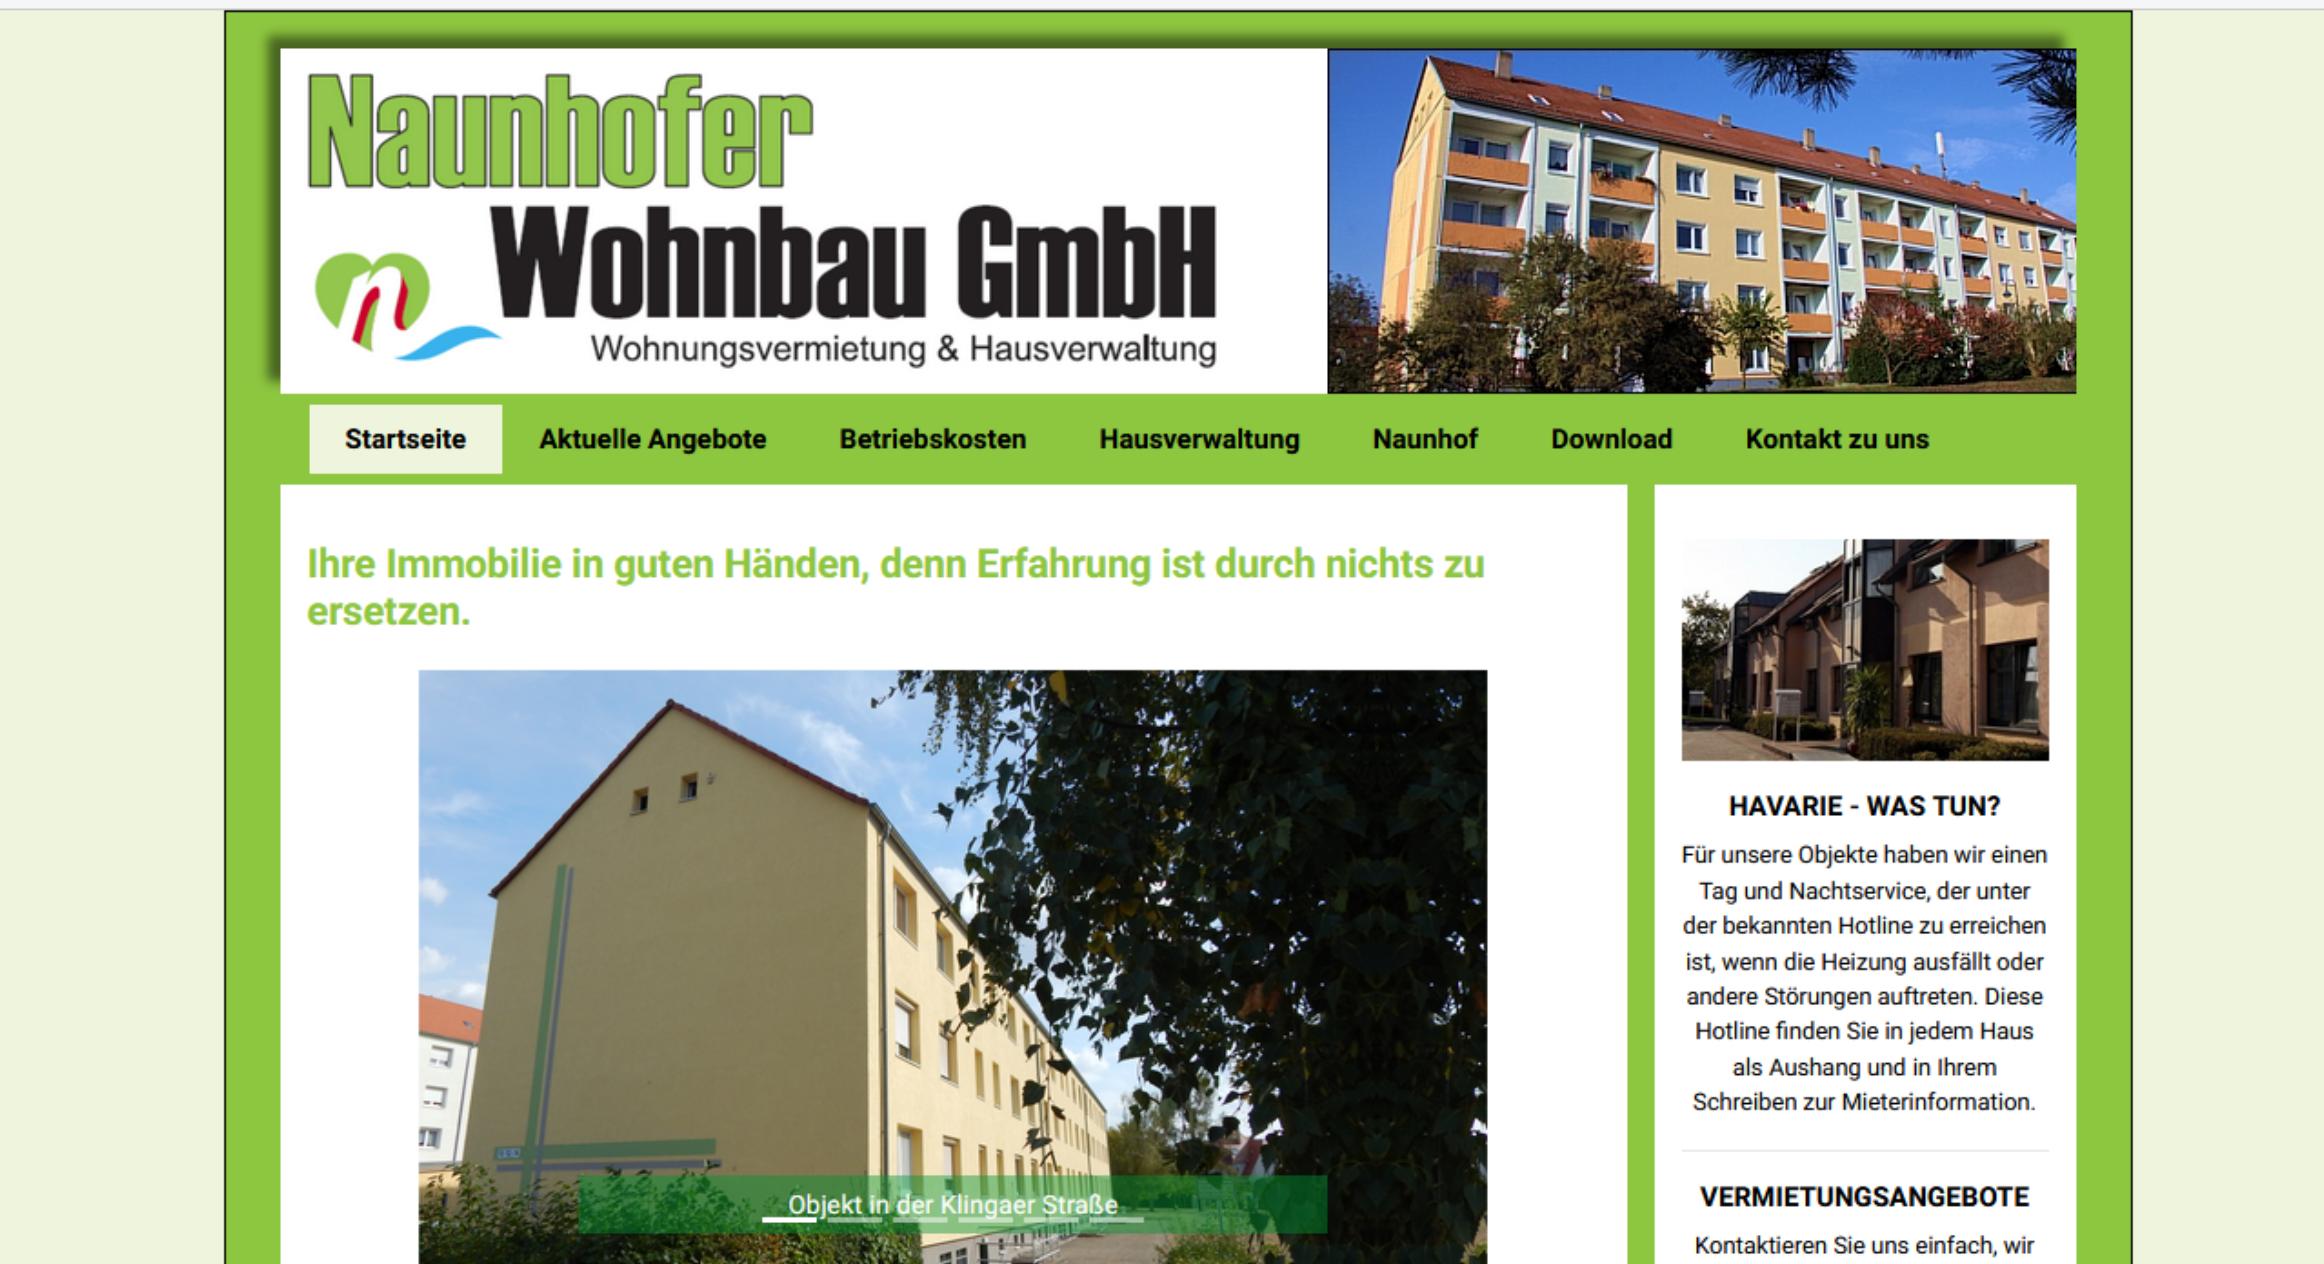 Referenz Naunhofer Wohnbau GmbH